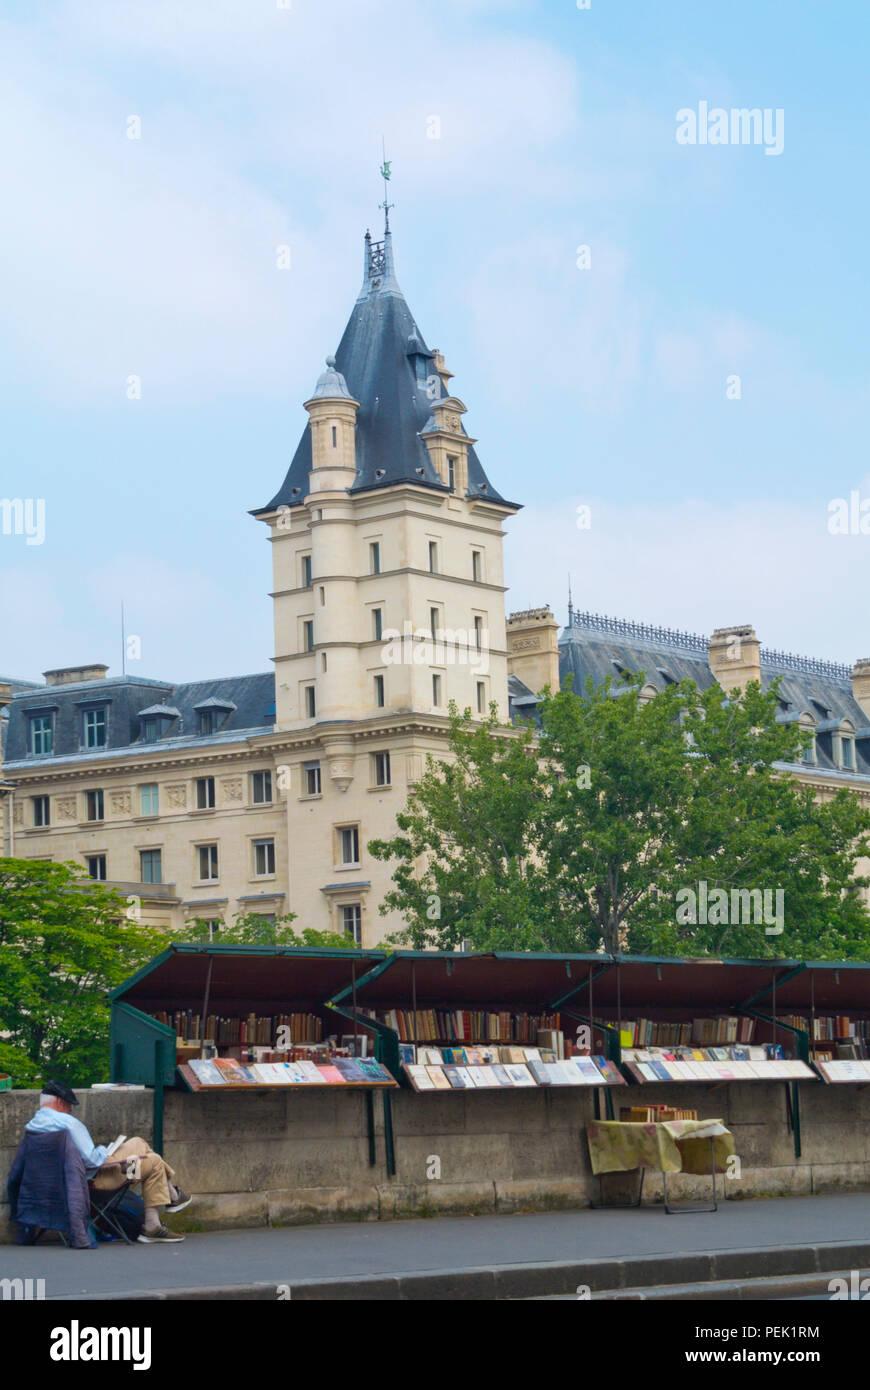 Outdoor second hand bookseller, Quai des Grands Augustins, Paris, France - Stock Image